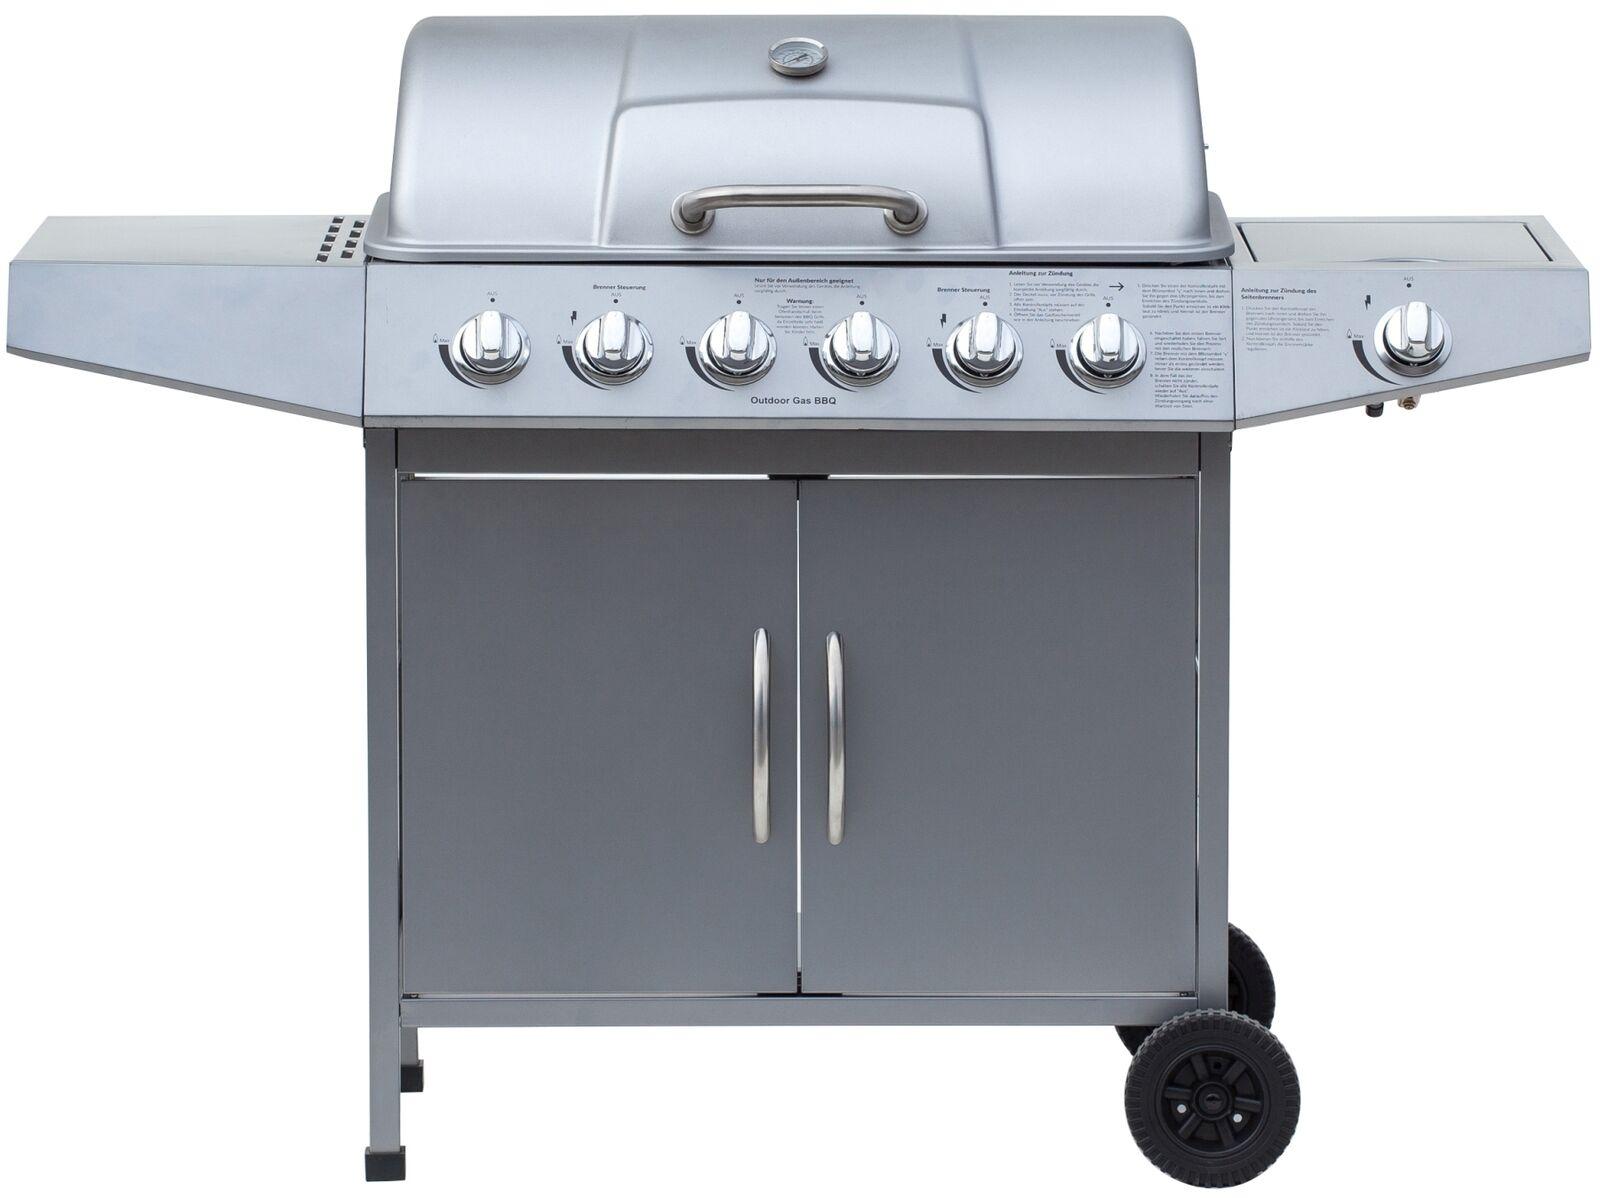 Gasgrill In Outdoor Küche Integrieren : Gasgrill für küche outdoorküche weber bbq weber gasgrill outdoor